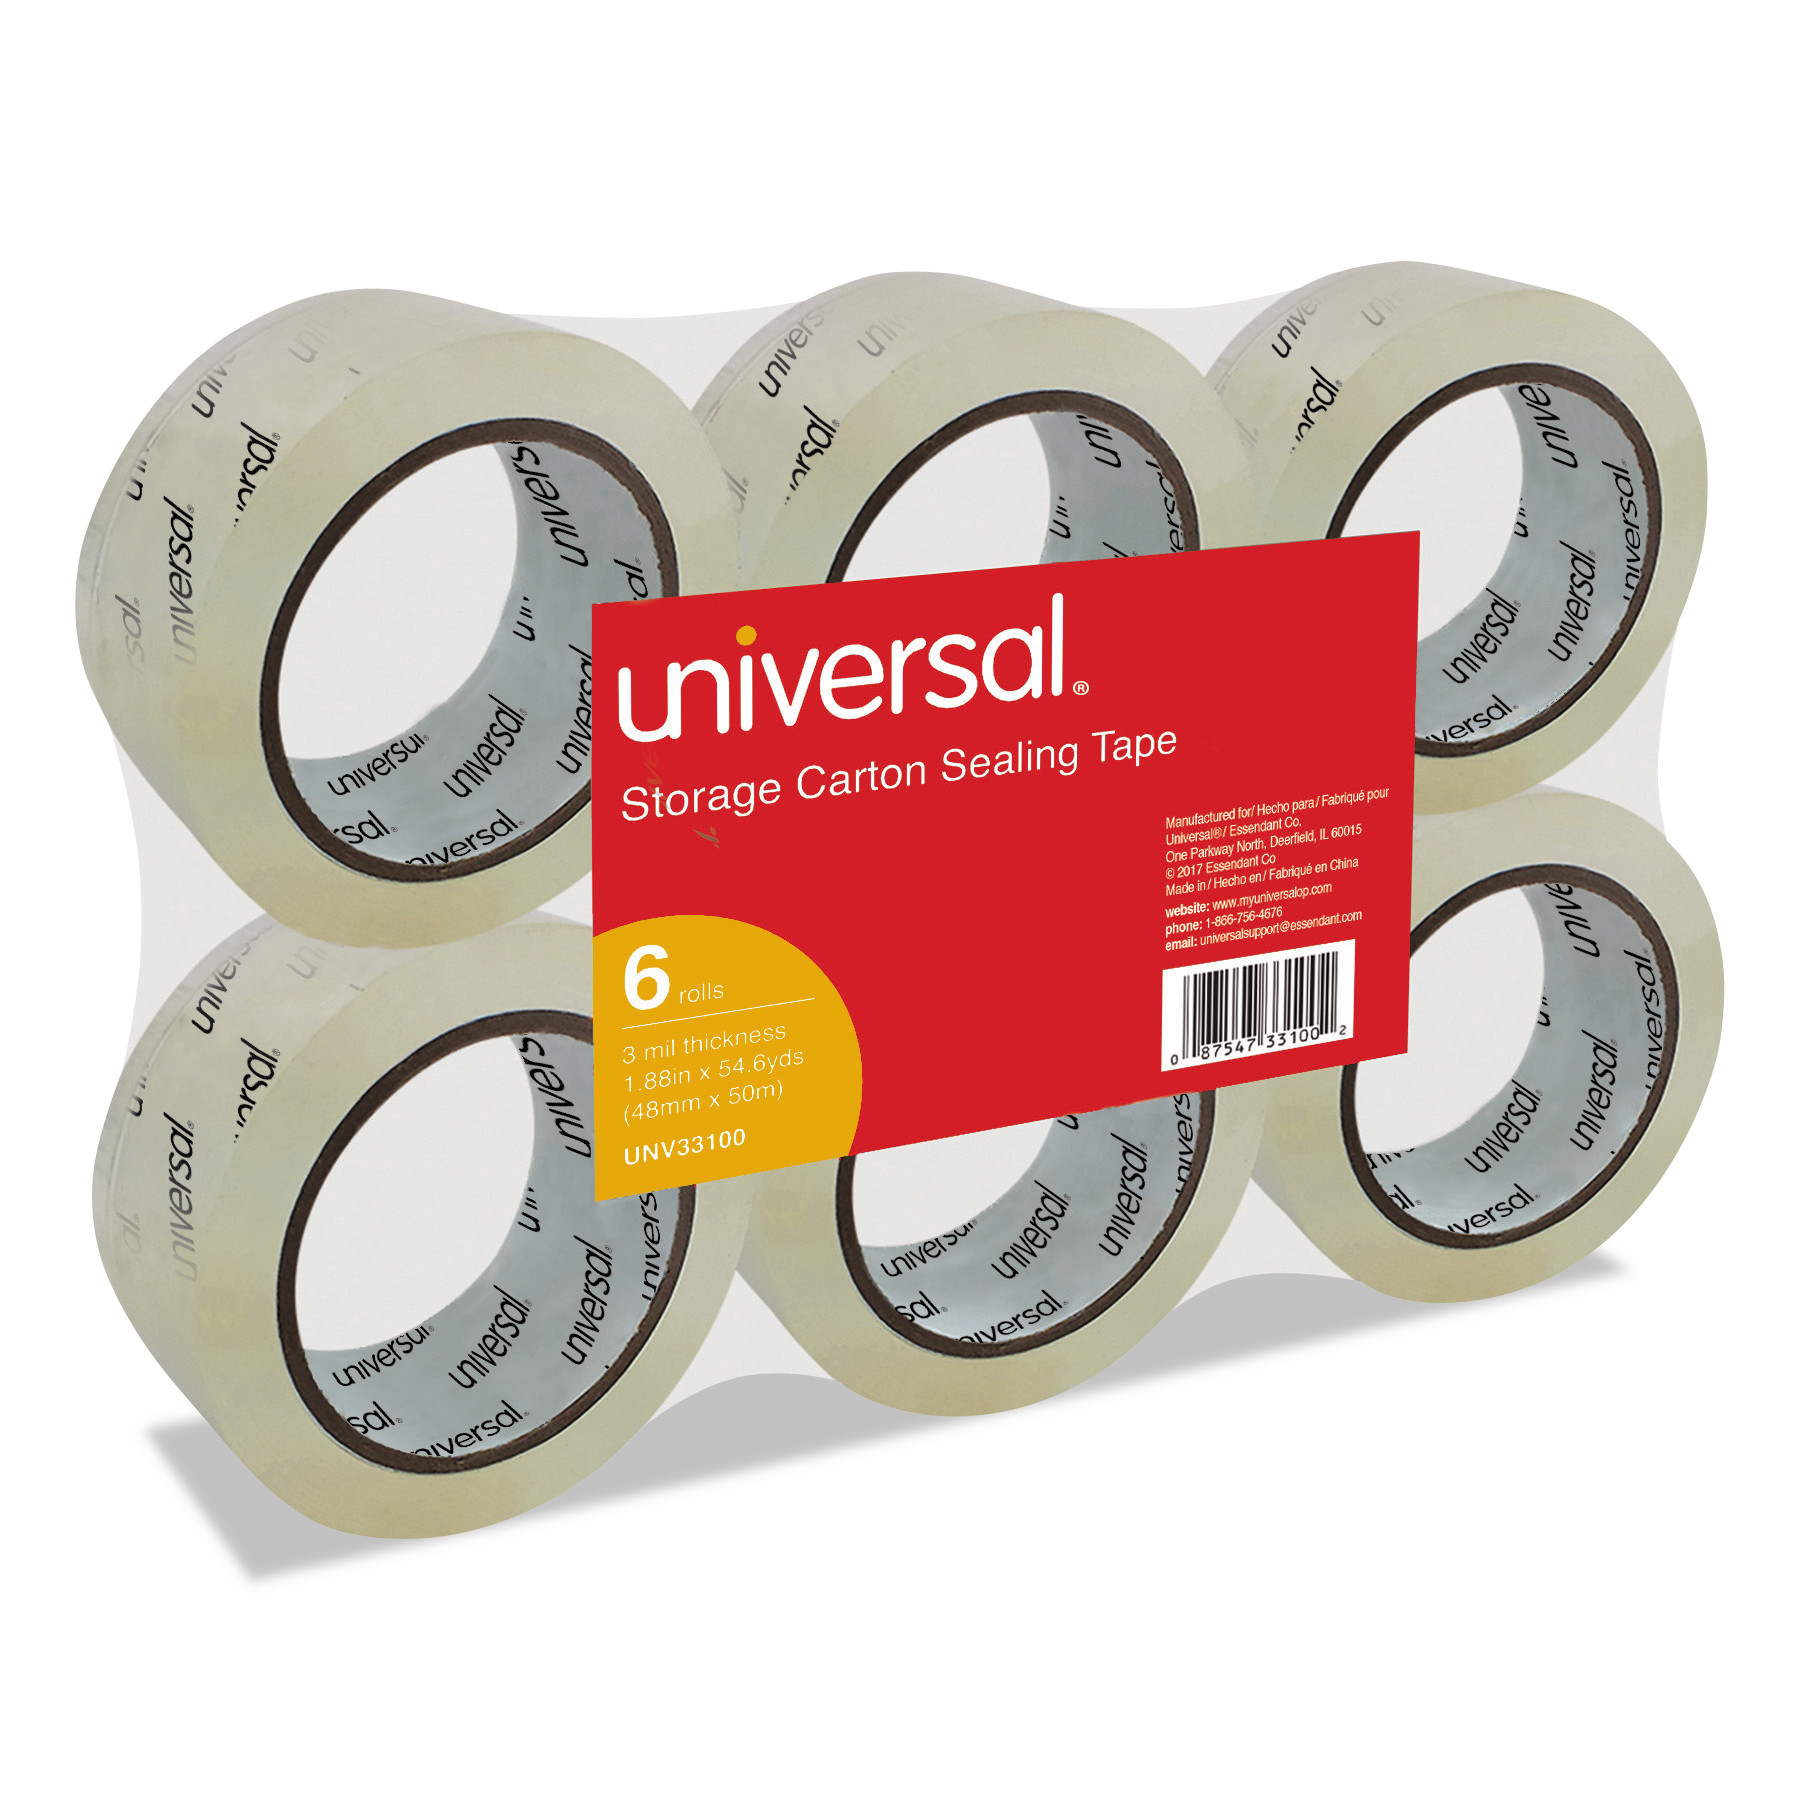 "Universal Heavy-Duty Acrylic Box Sealing Tape, 48mm x 50m, 3"" Core, Clear, 6/Pack -UNV33100"